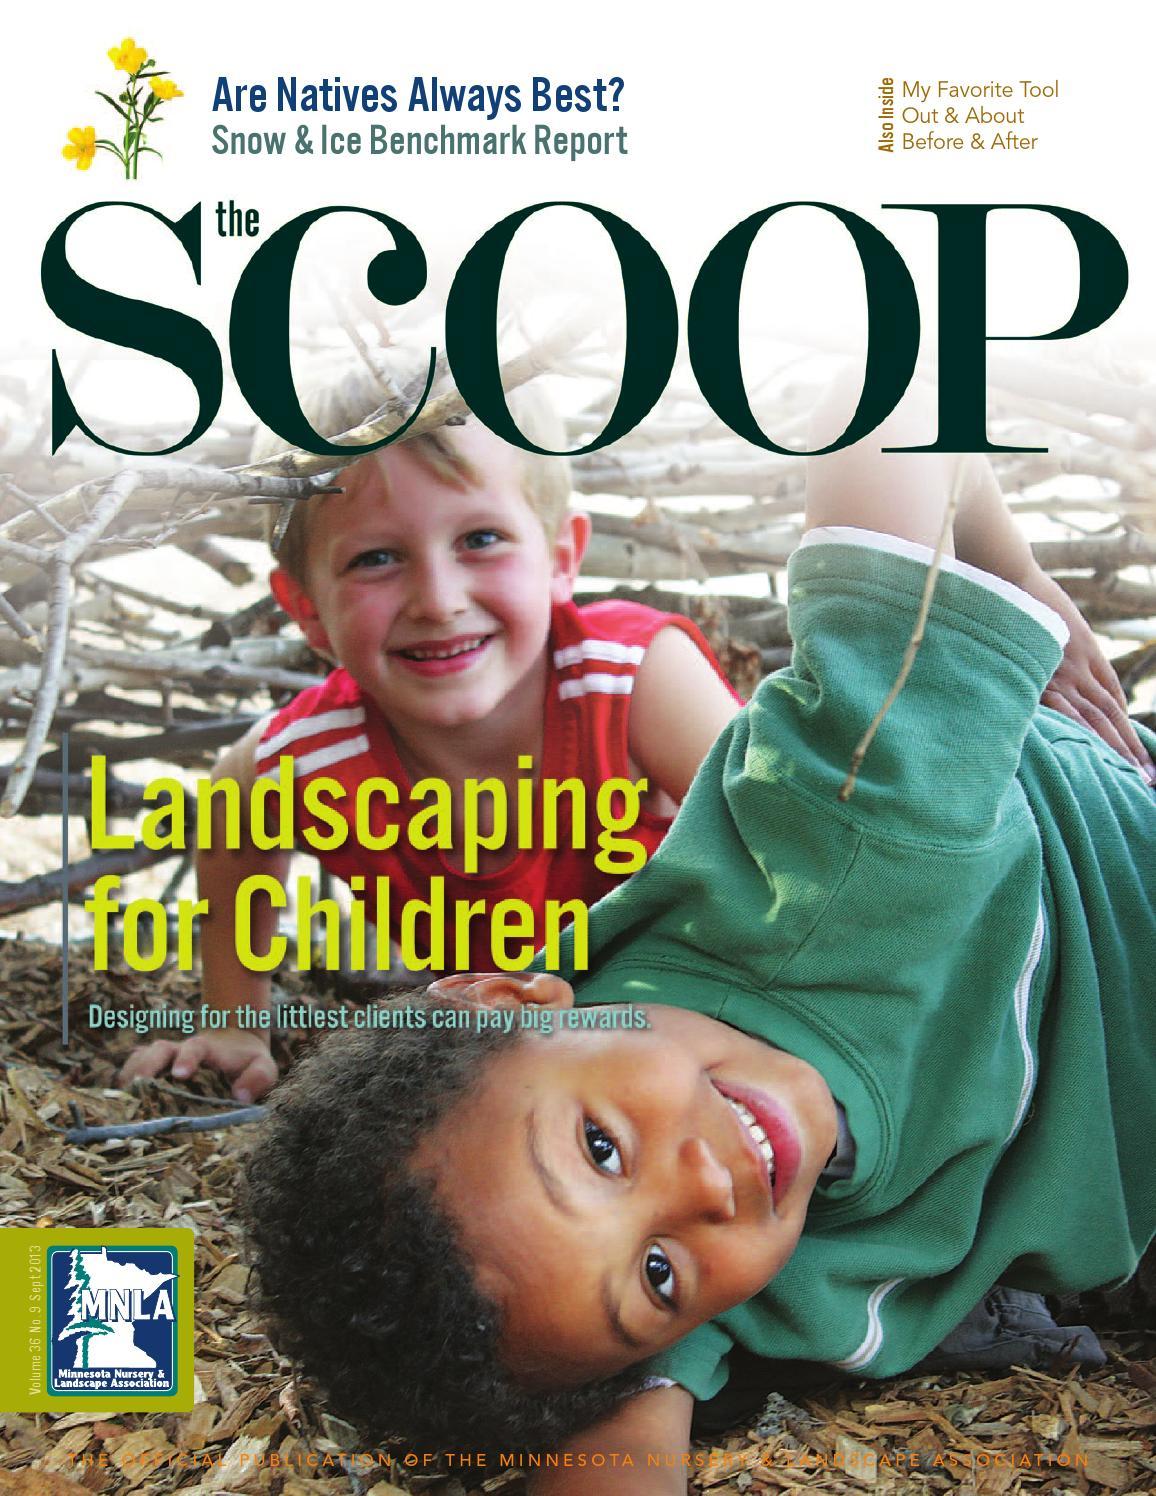 The Scoop Online September 2013 By Minnesota Nursery Amp Landscape